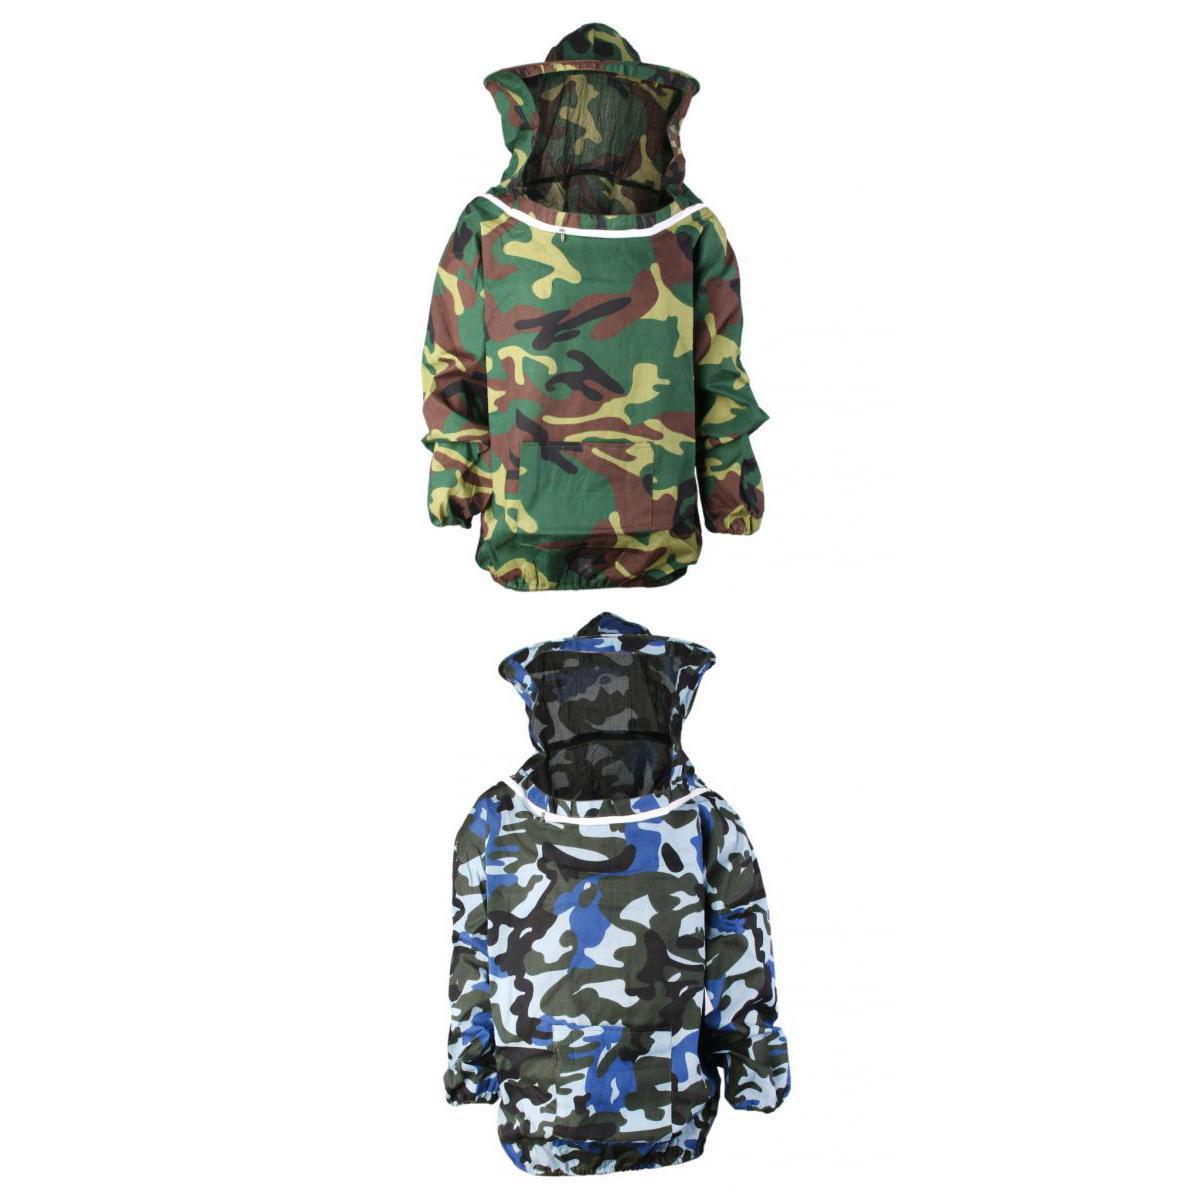 2Pcs Camo Beekeeping Jacket Veil Suit Hat Pull Over Smock Dress Equipment